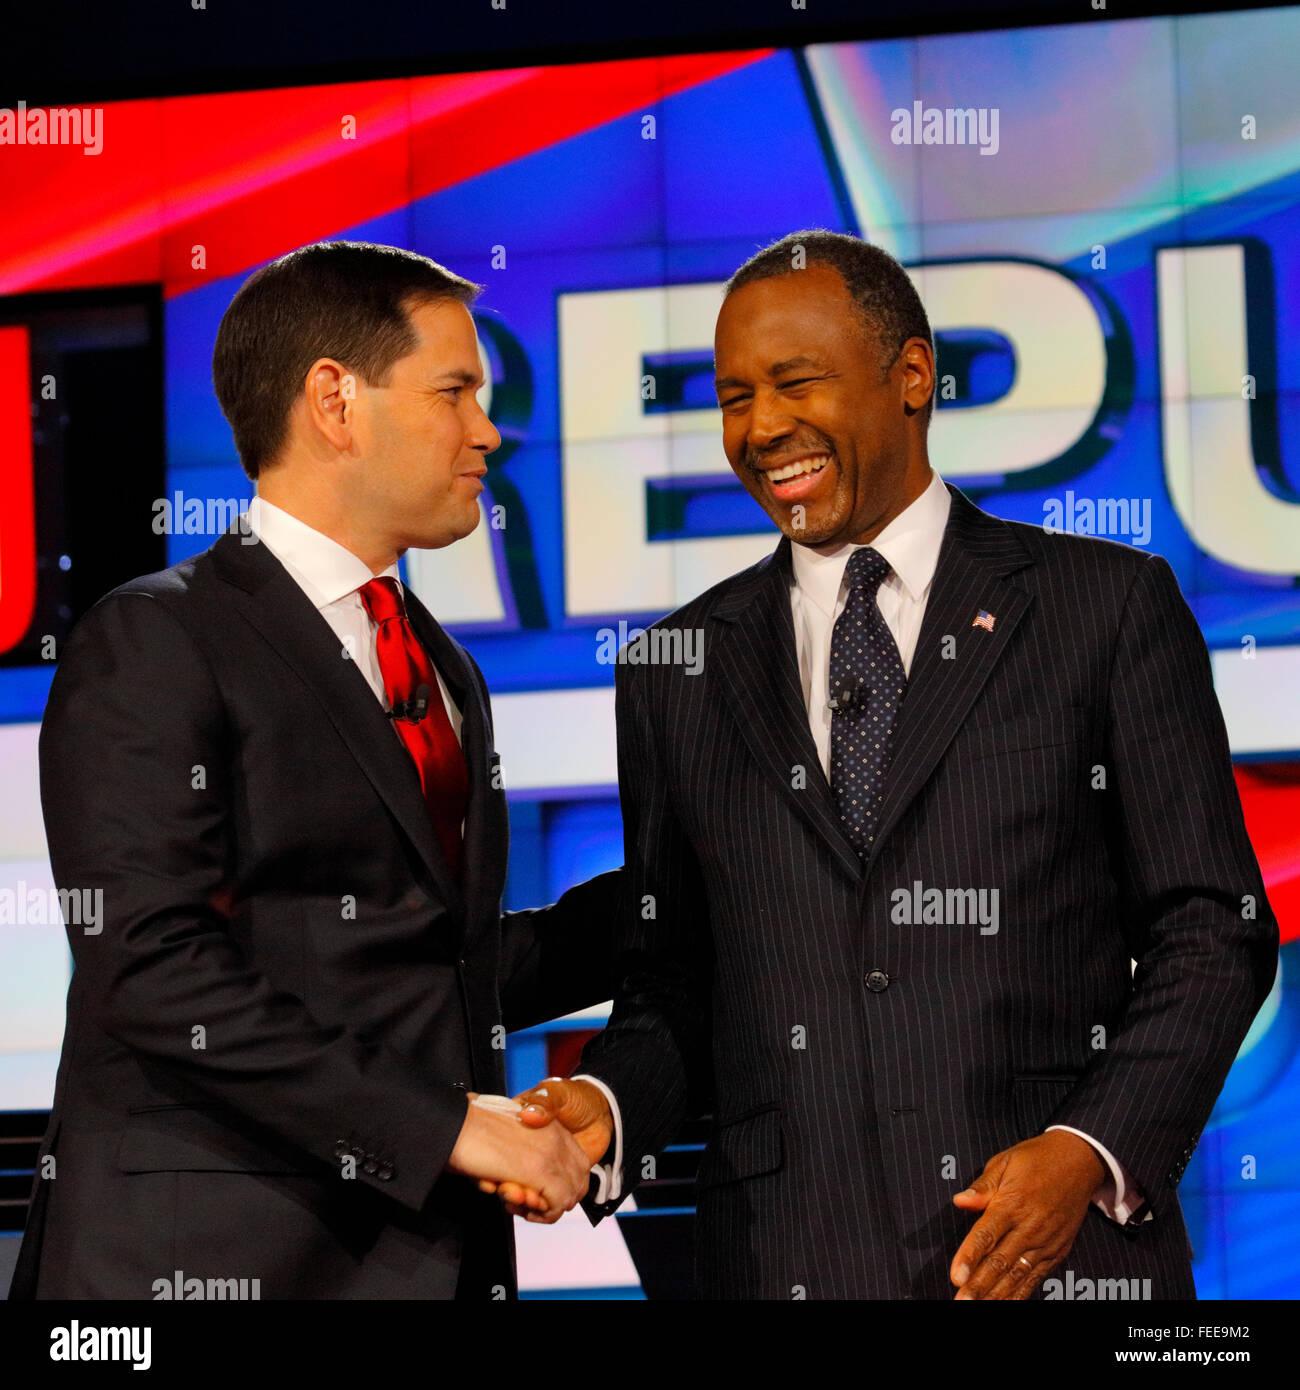 LAS VEGAS - 15 Dezember: Republikanische Präsidentschaftskandidat ehemaligen Dr. Ben Carson schüttelt Hände mit Senator Marco Rubio bei CNN republikanische Präsidentschafts-Debatte im venezianischen, 15. Dezember 2015, Las Vegas, Nevada Stockfoto